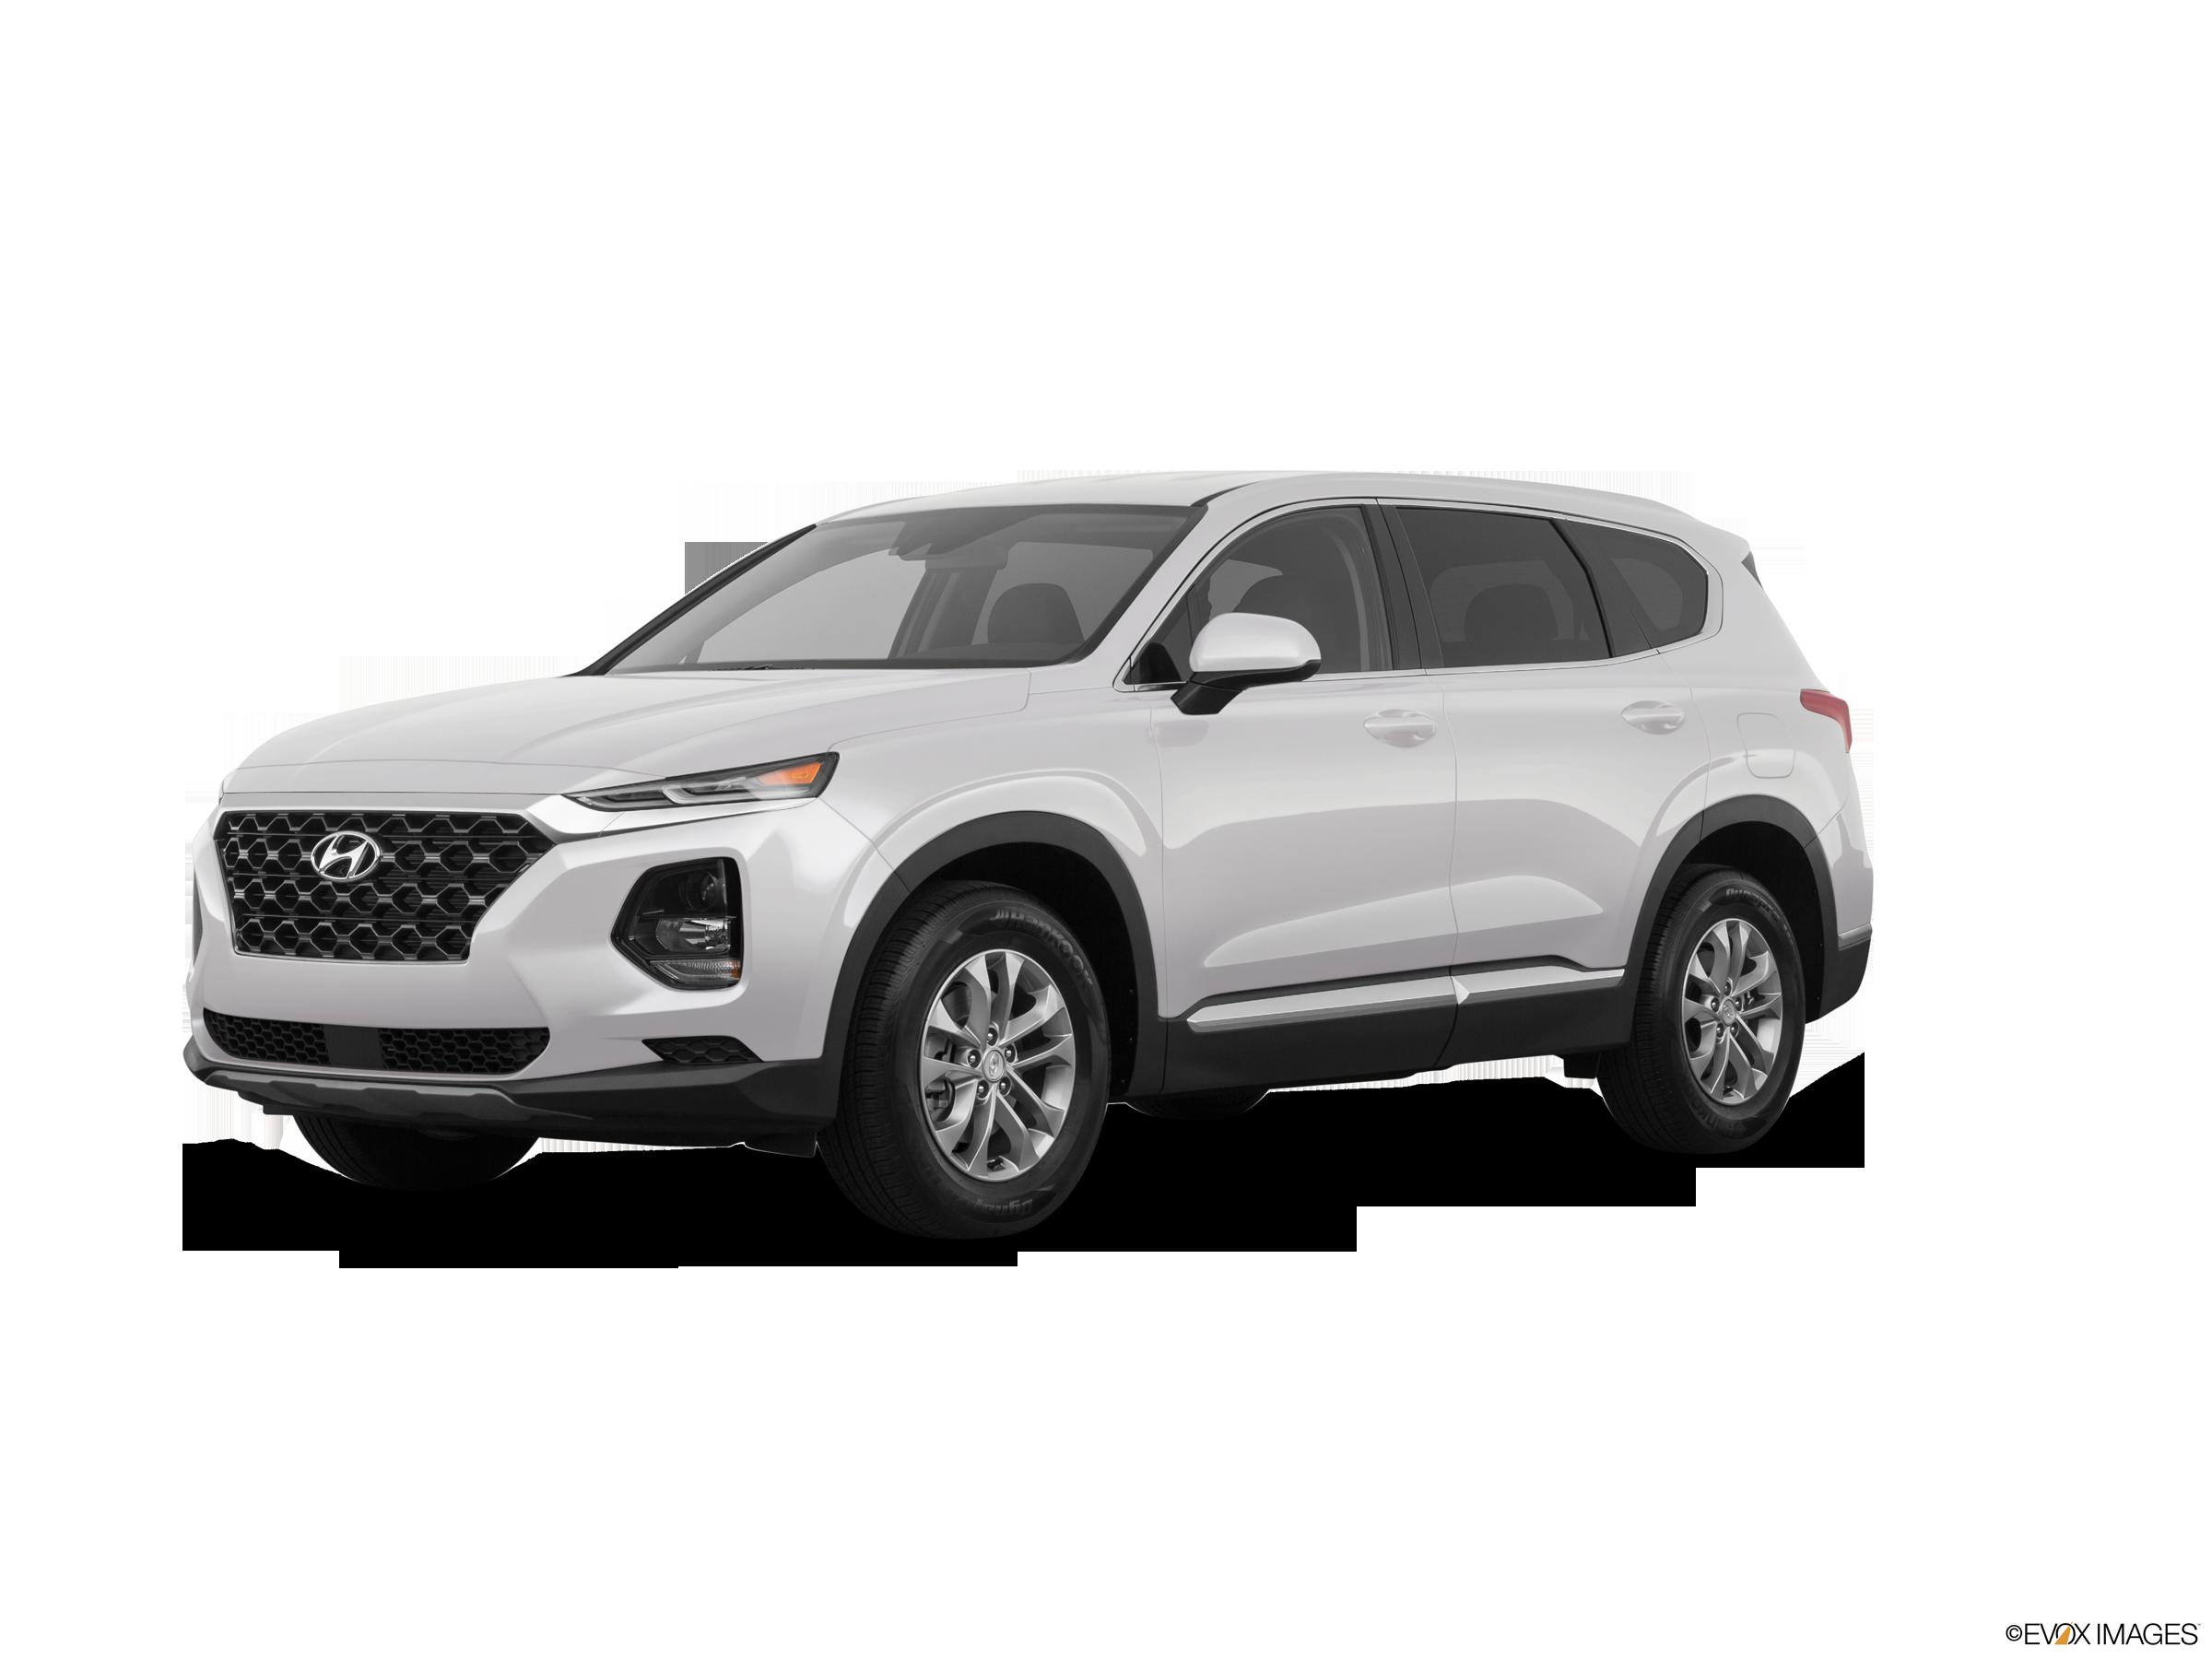 2019 Hyundai Santa Fe Prices Reviews Pictures Kelley Blue Book